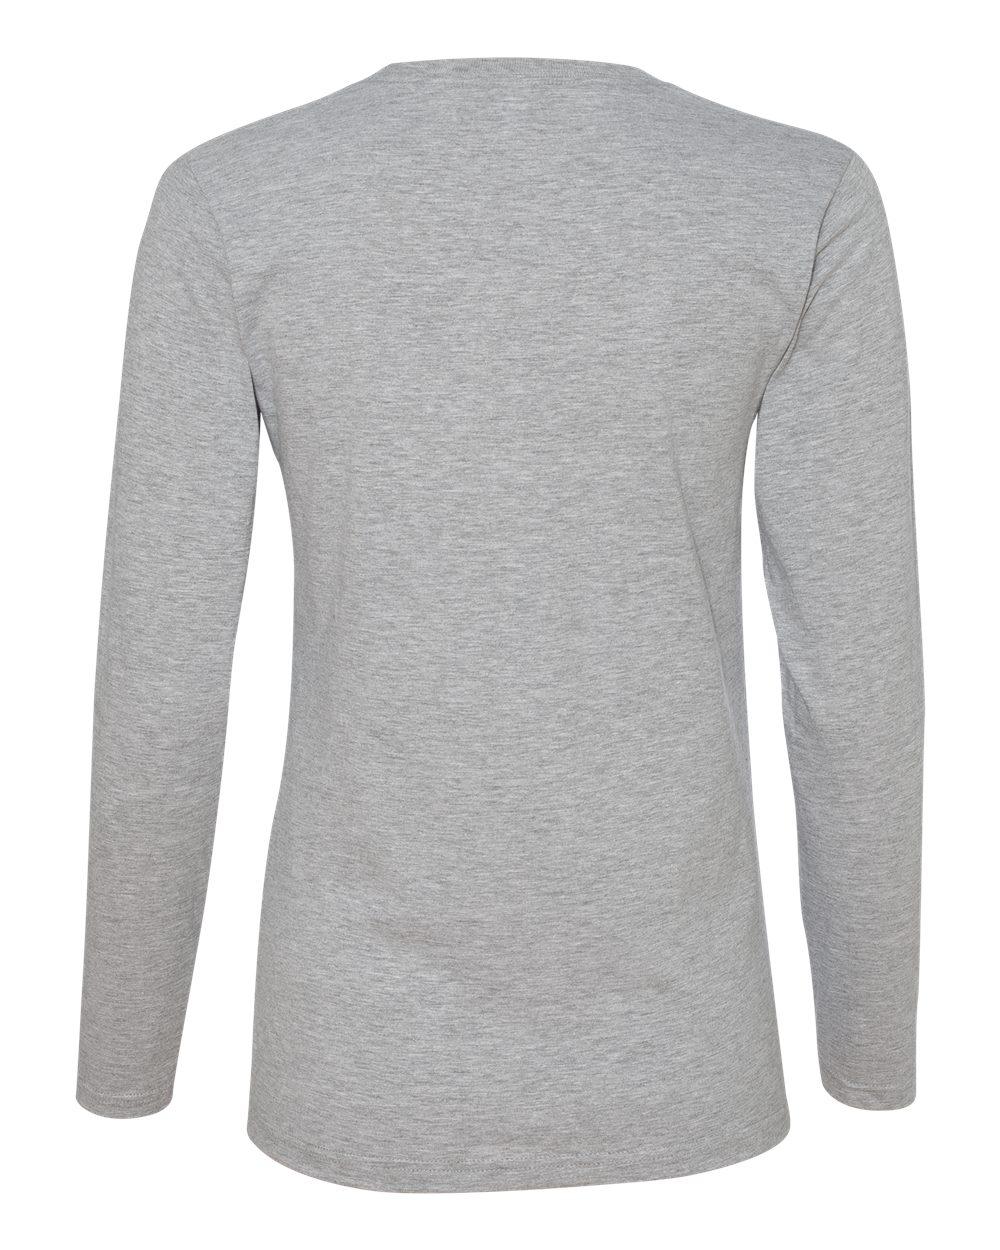 Anvil-Womens-Lightweight-Long-Sleeve-T-Shirt-884L-Size-S-2XL thumbnail 14